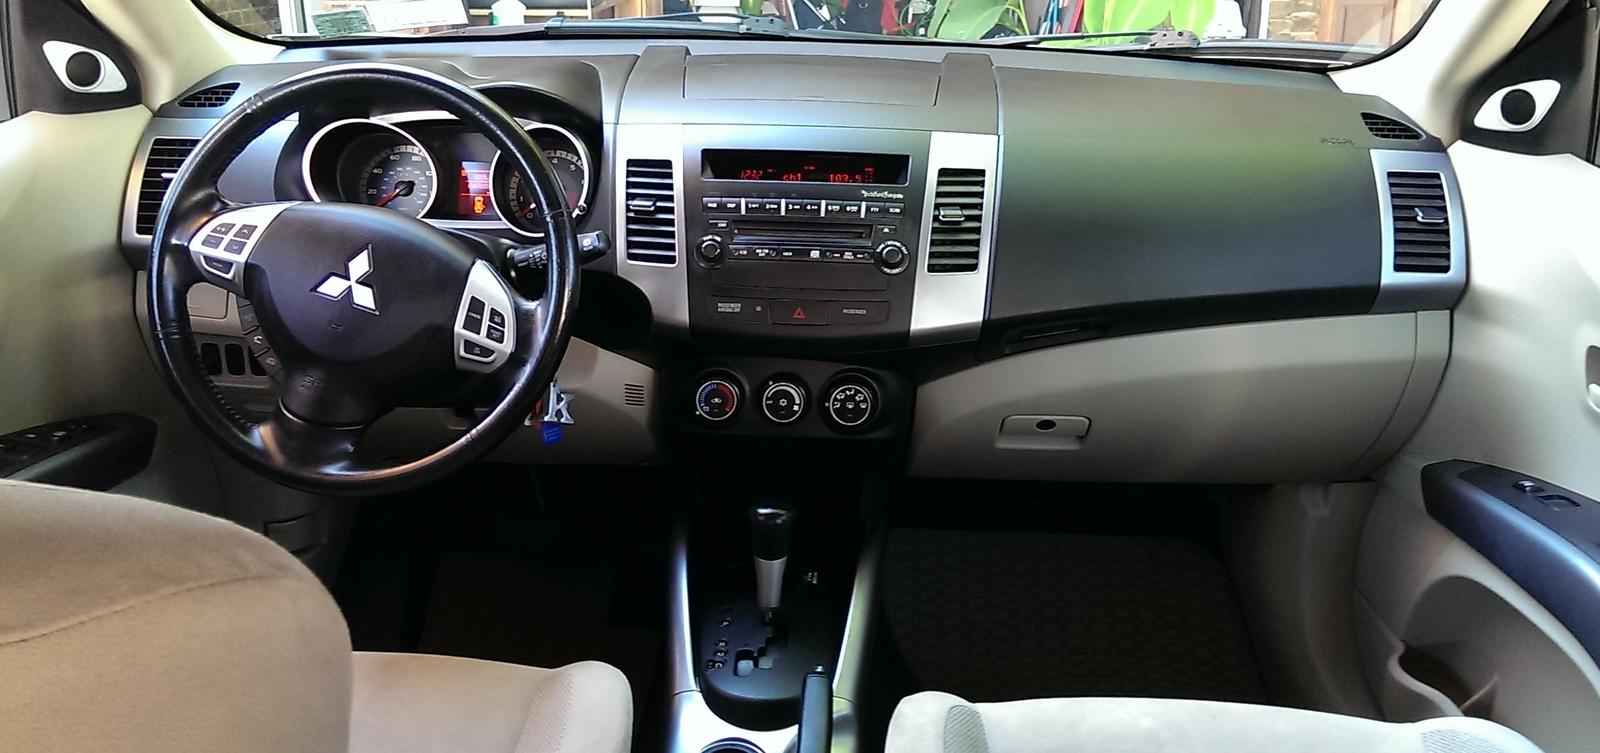 Mitsubishi Outlander Ls Pic